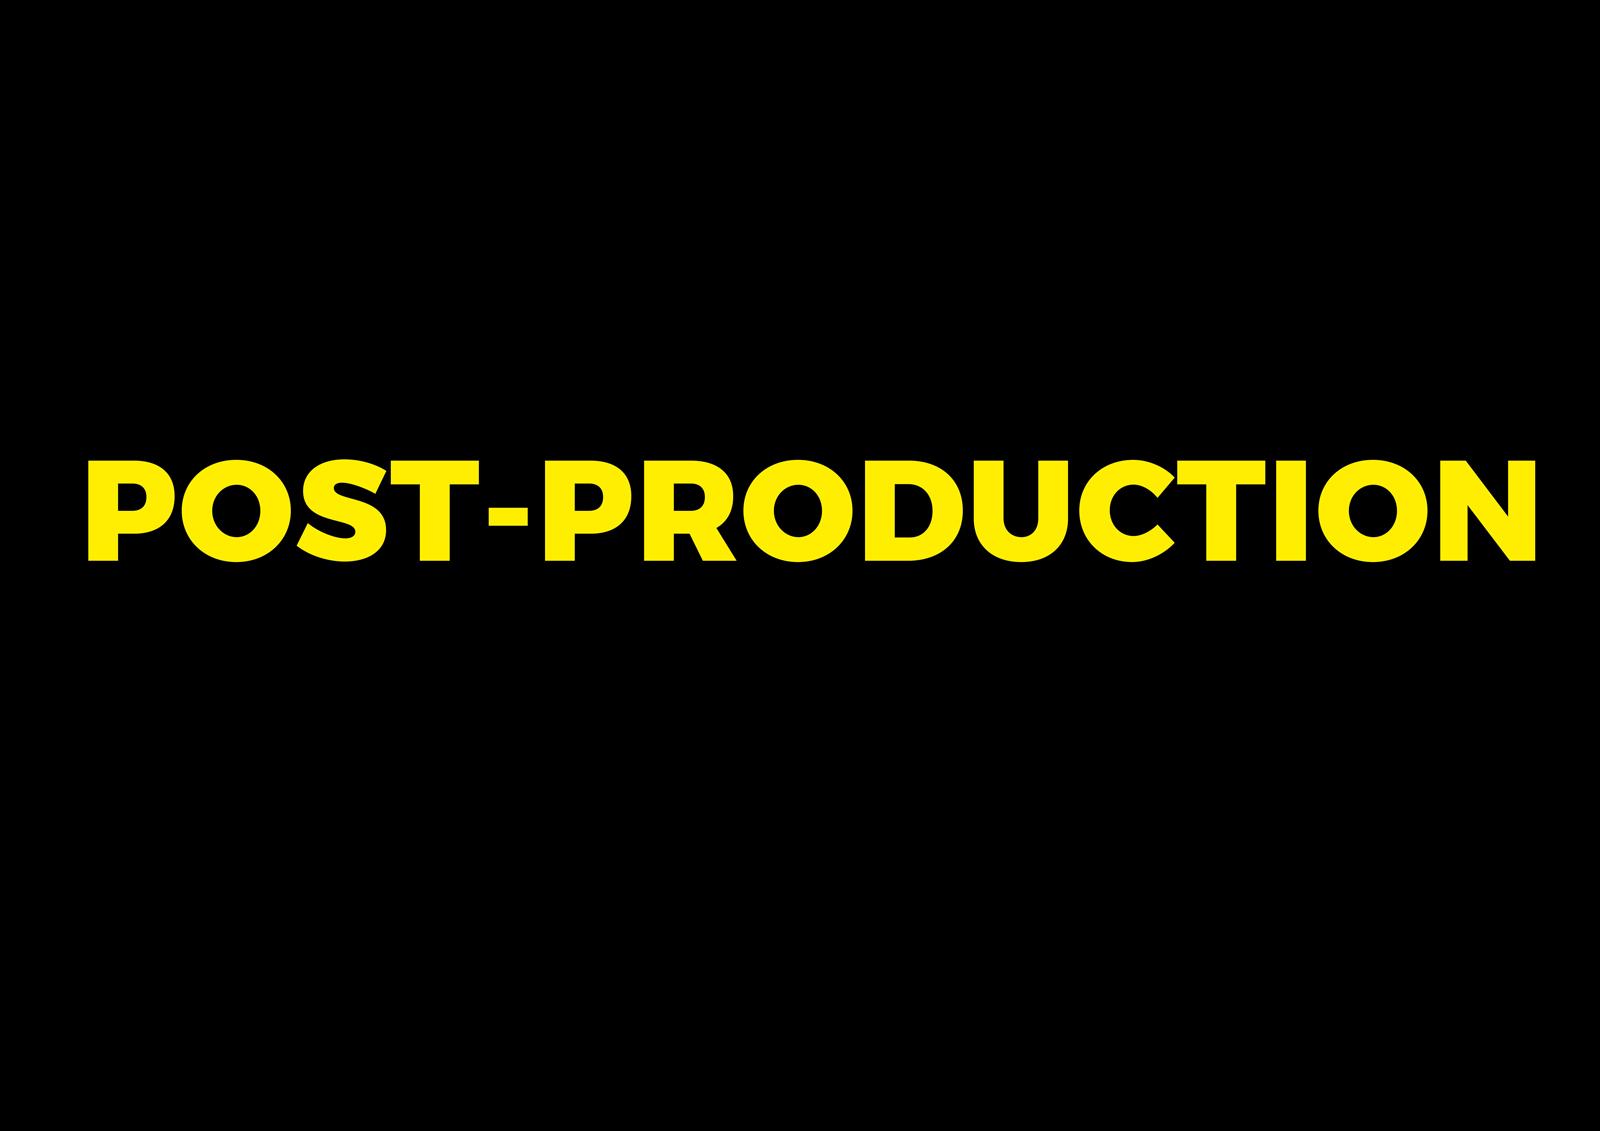 POST-PRODUCTION-WEB.jpg